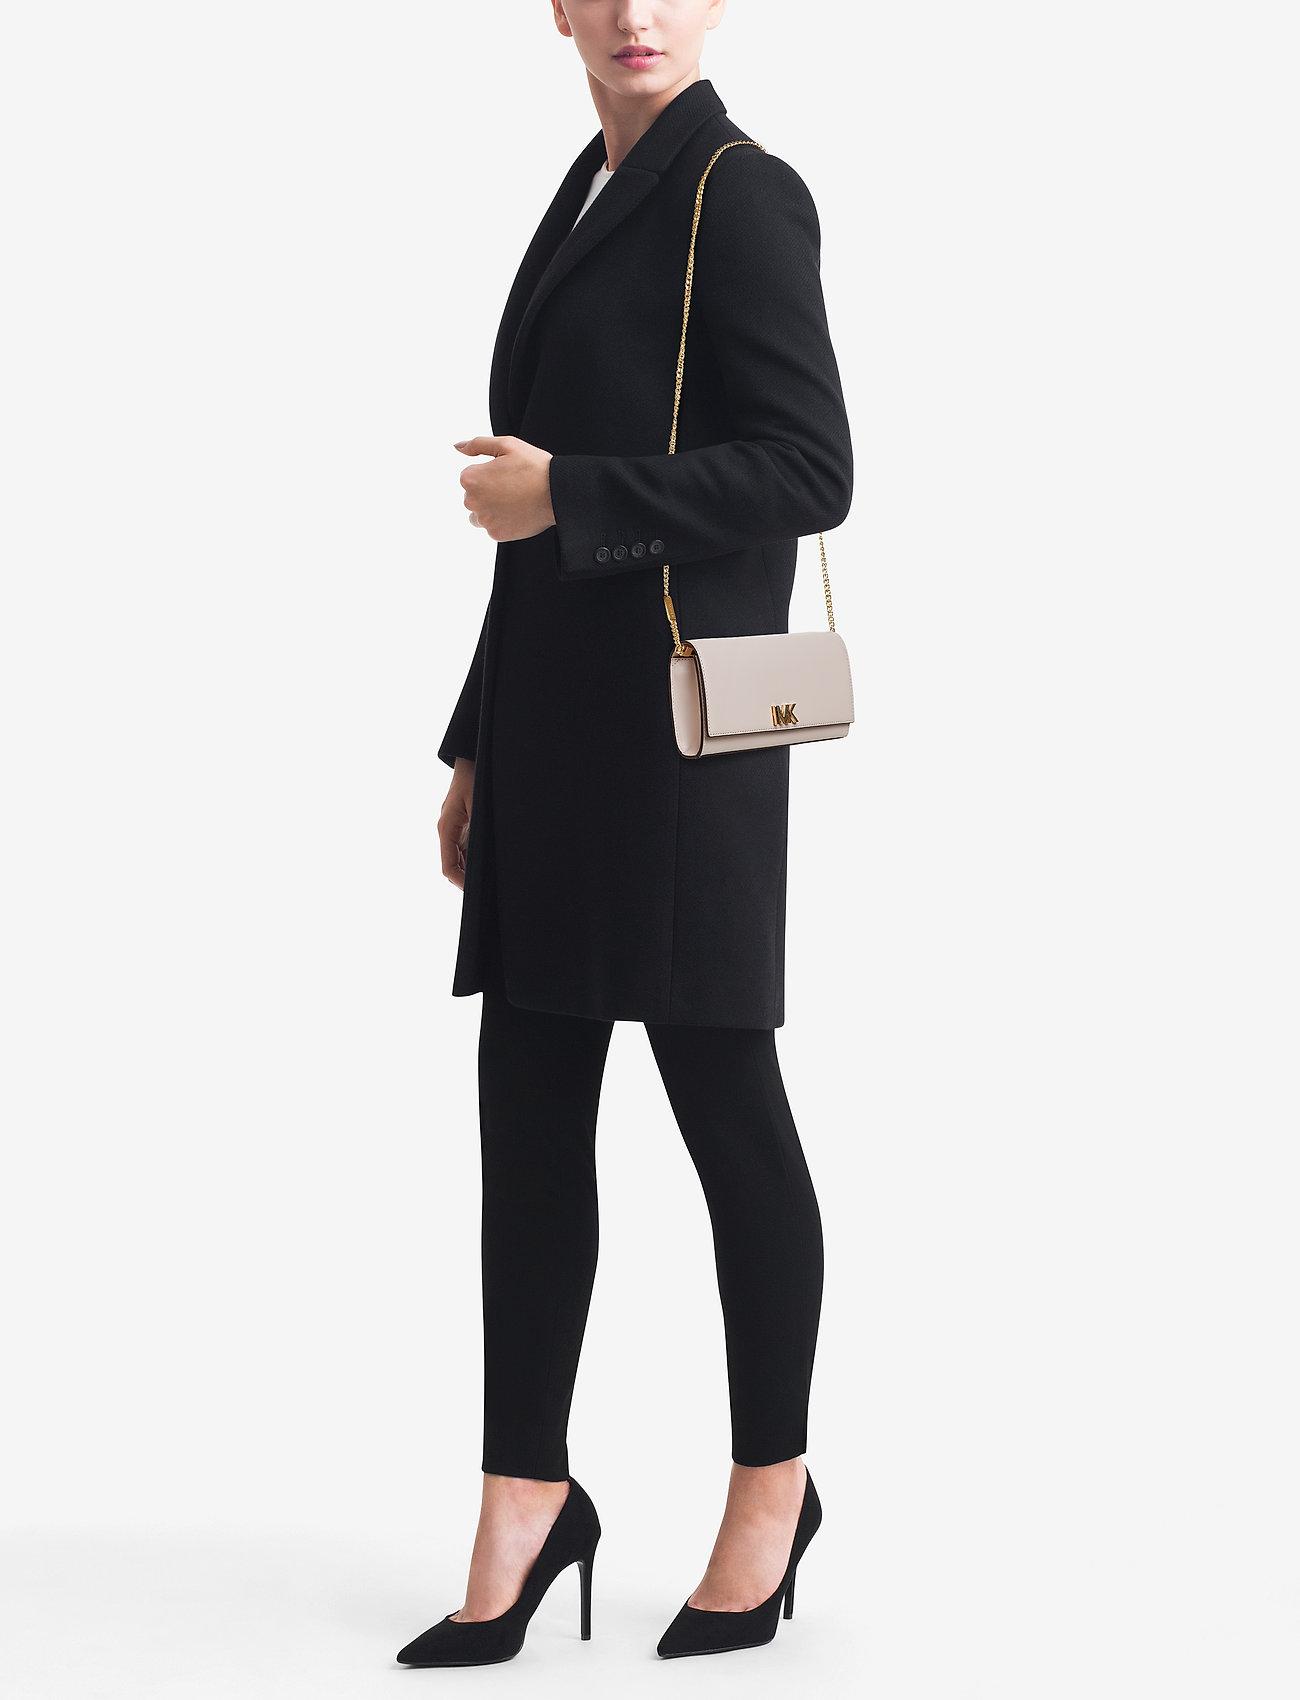 Michael Kors Bags LG EW CLUTCH